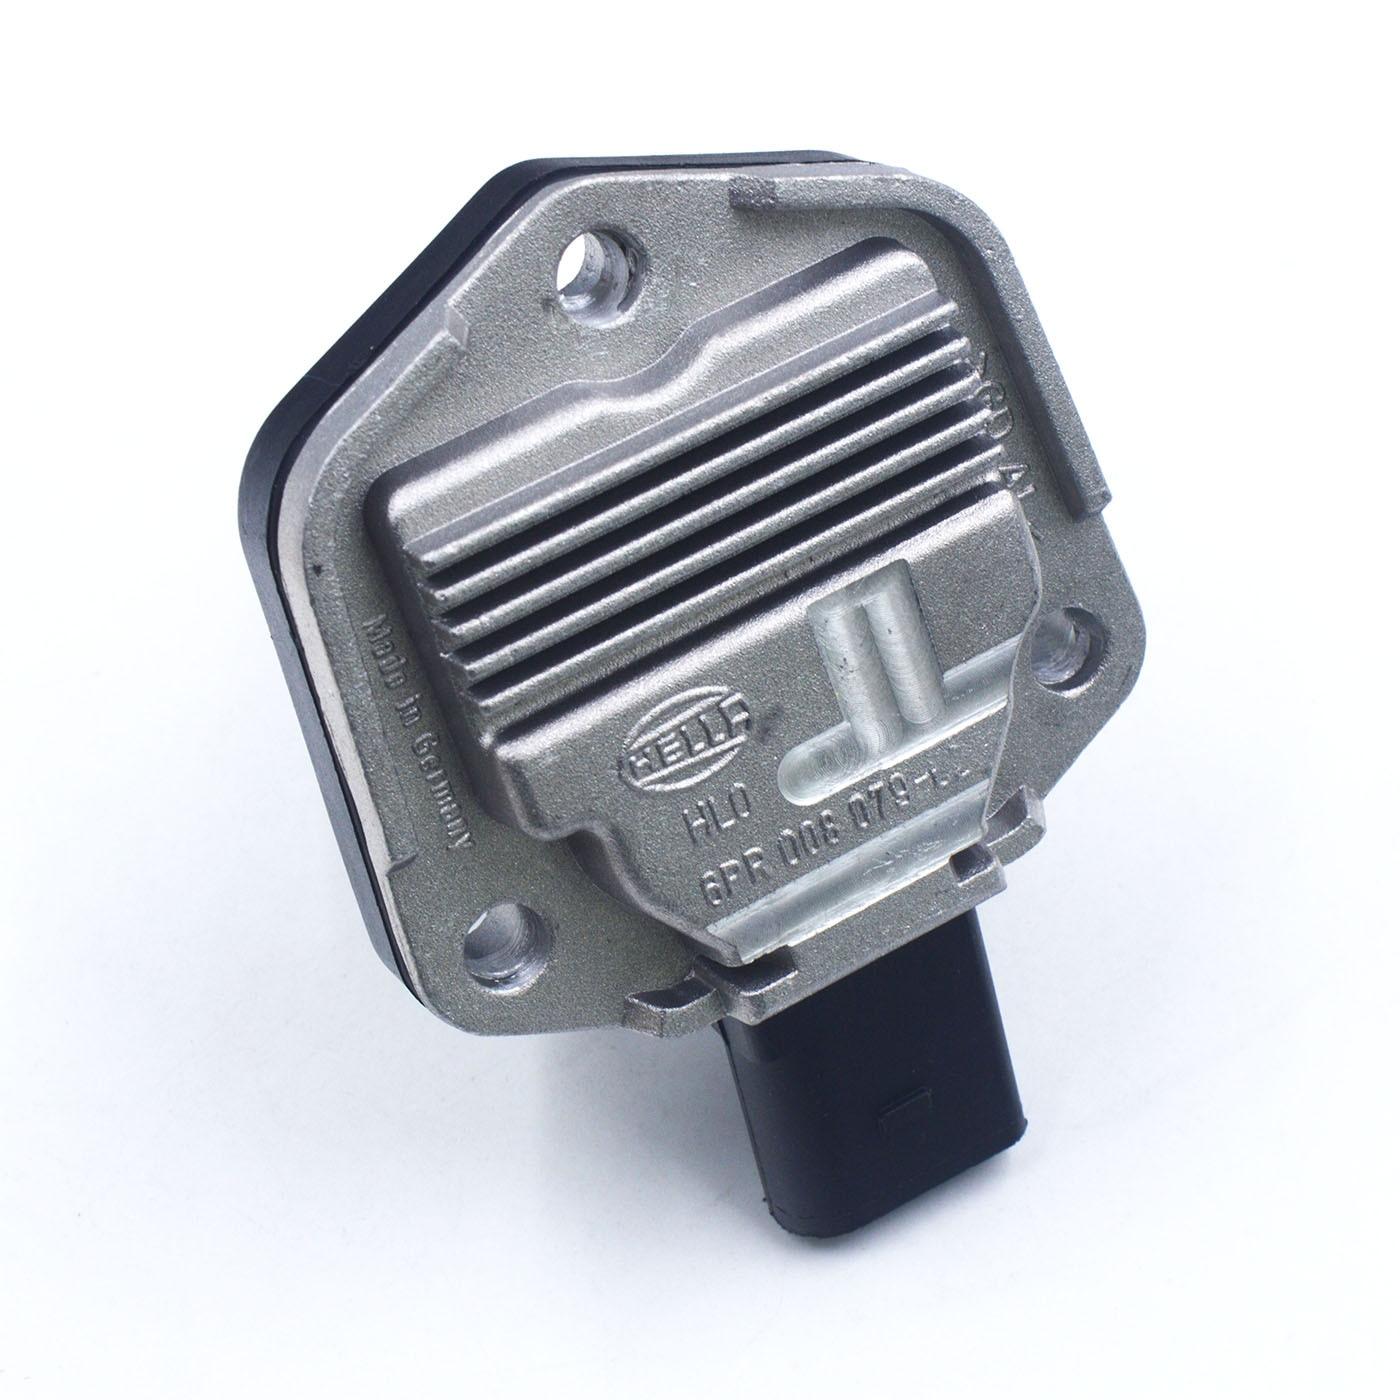 OEM For Volkswagen VW Passat B5 Bora Golf Jetta MK4 Audi A6 C5 A4 B6/B7 Allroad Quattro A8 Sump Oil Level Sensor 1J0 907 660 B/A